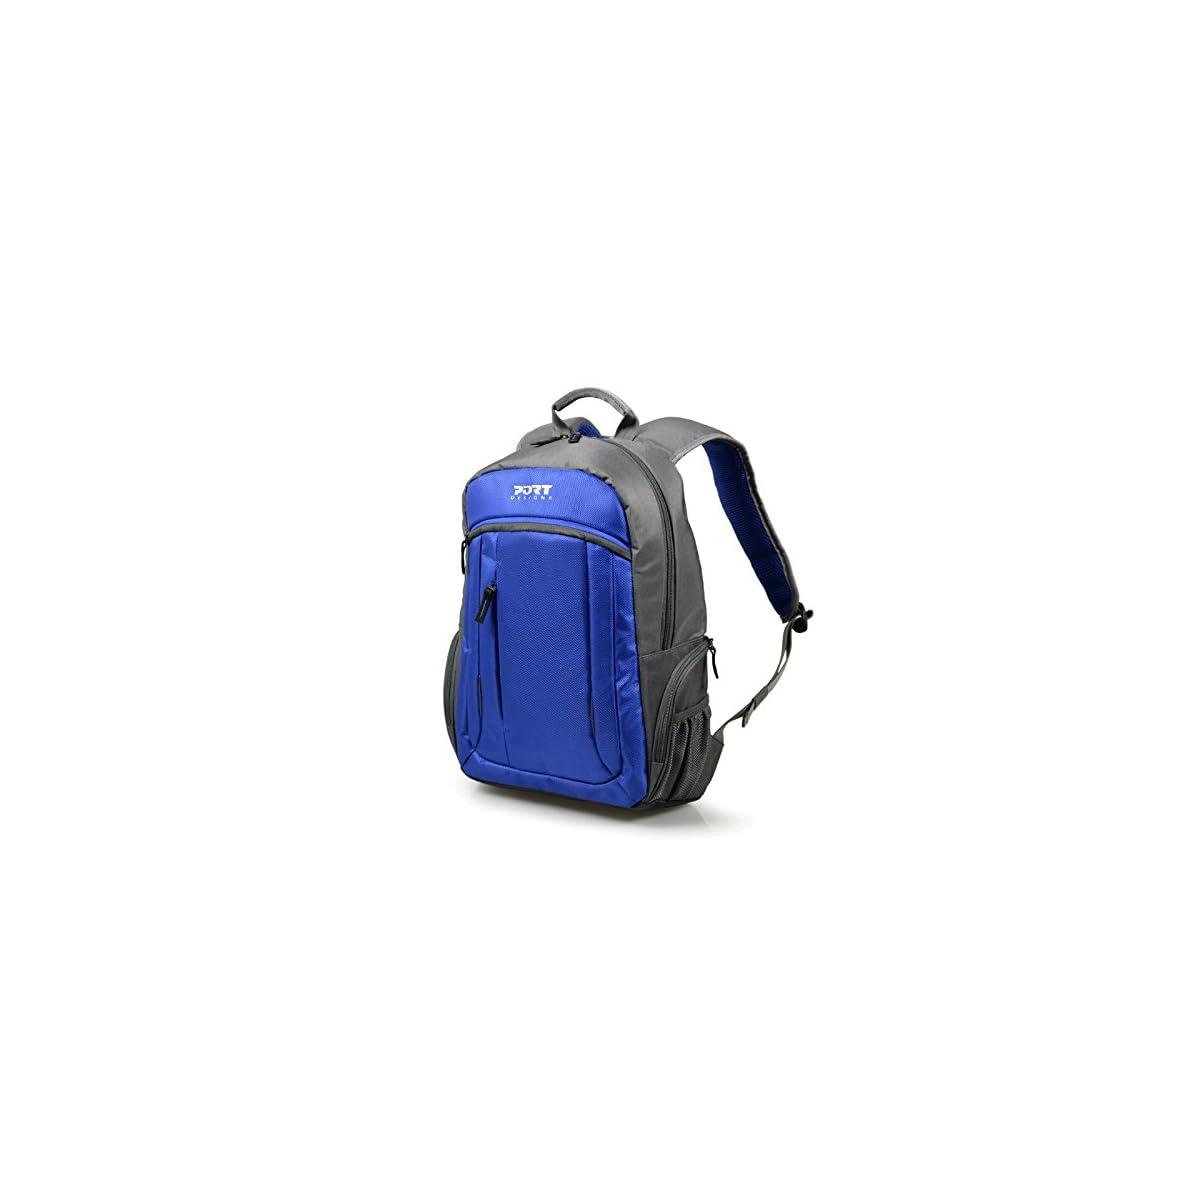 "51qFD1L XDL. SS1200  - Port Designs VALMOREL Mochila Nylon, Poliéster Azul - Mochila para portátiles y netbooks (Nylon, Poliéster, Azul, 39,6 cm (15.6""), Cremallera, 820 g, 385 x 260 x 35 mm)"